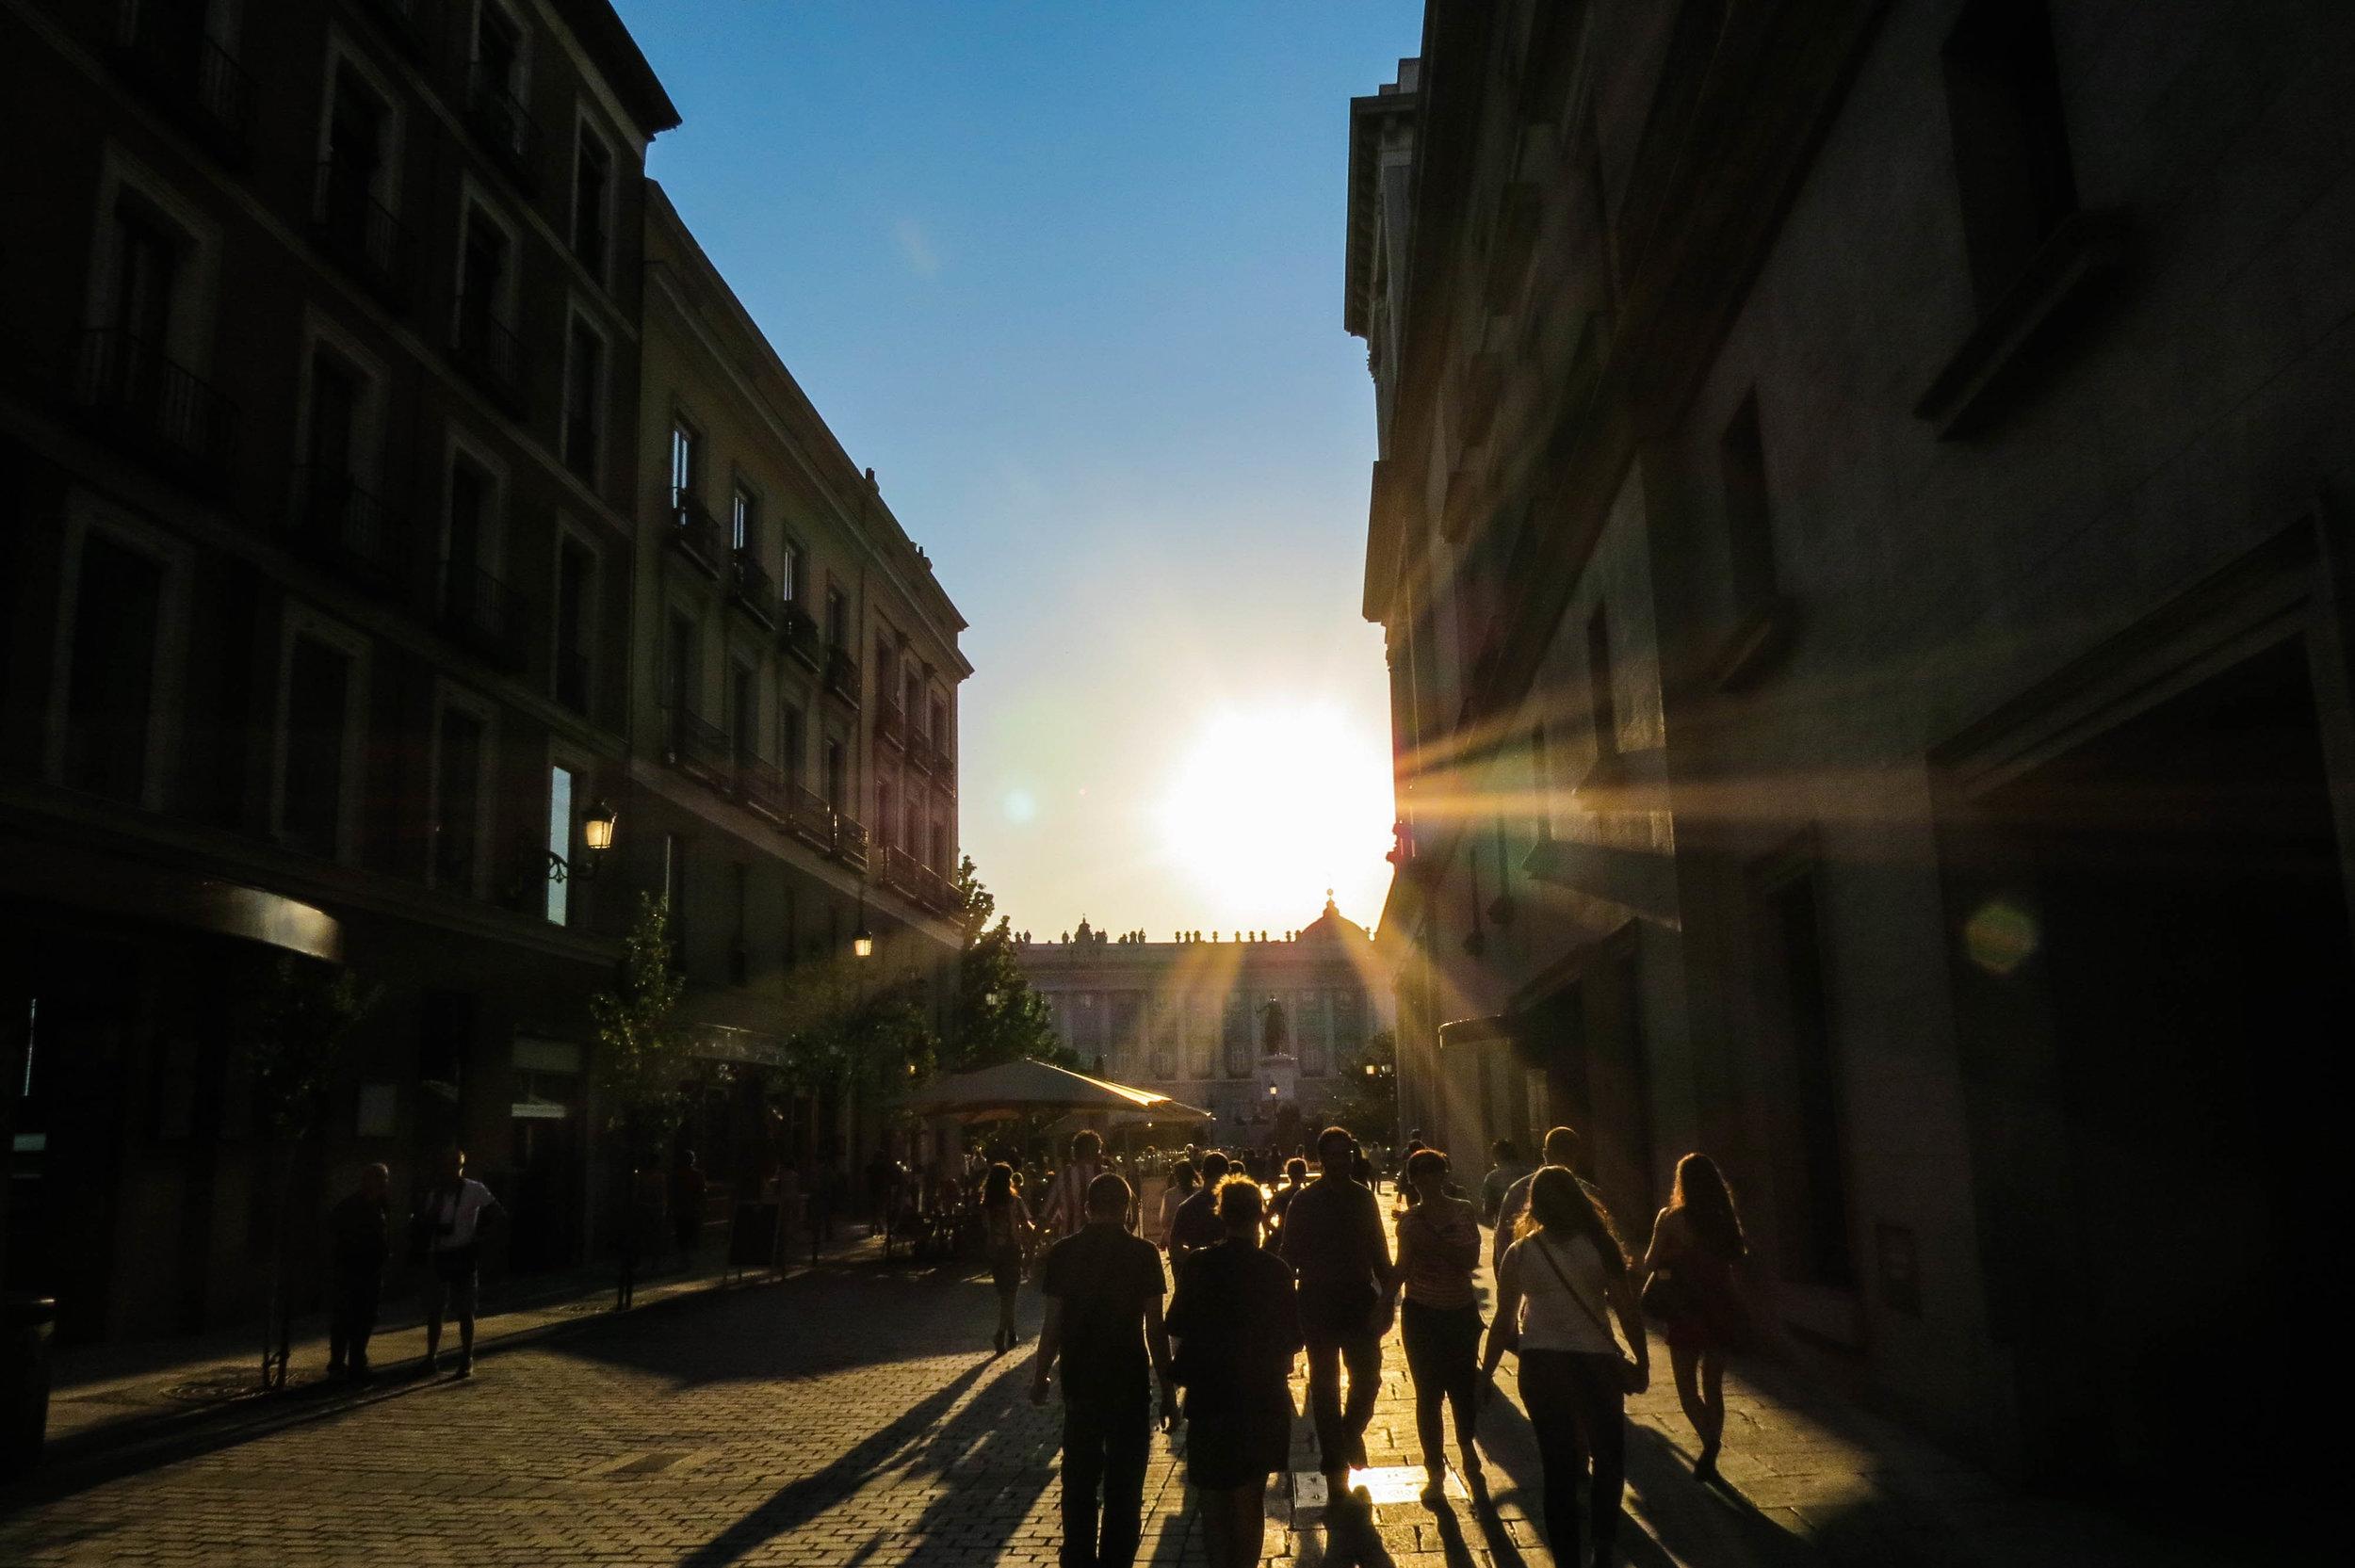 madrid-spain-streets-summer-33.jpg